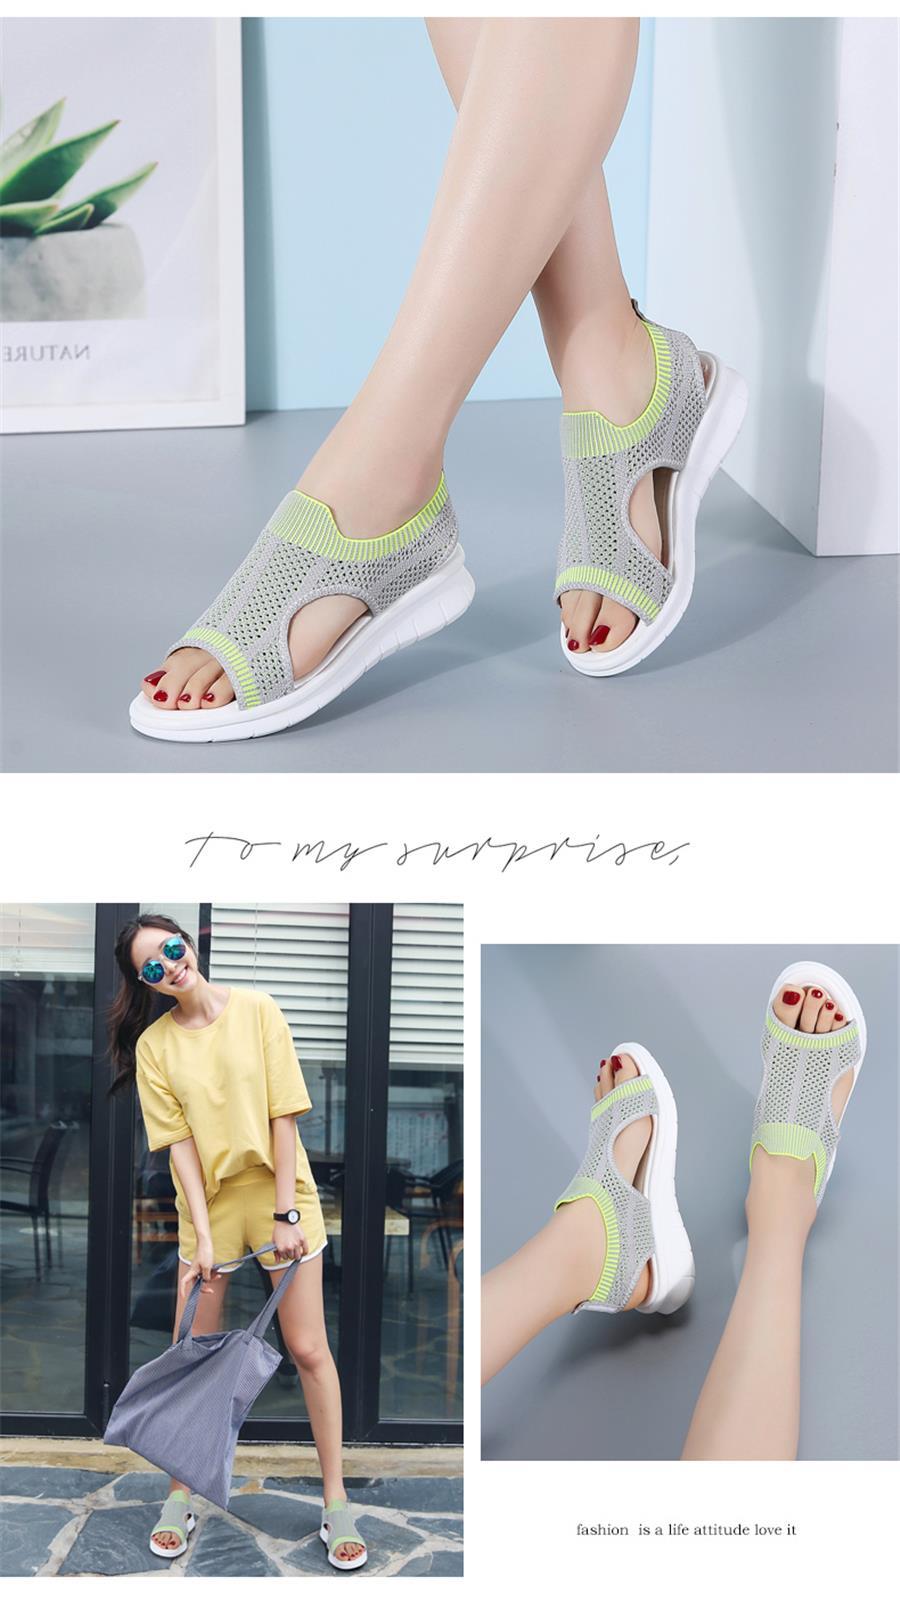 HTB1NJXdRhTpK1RjSZFMq6zG VXaN STQ Women sandals 2019 female shoes women summer wedge comfort sandals ladies flat slingback flat sandals women sandalias 7739